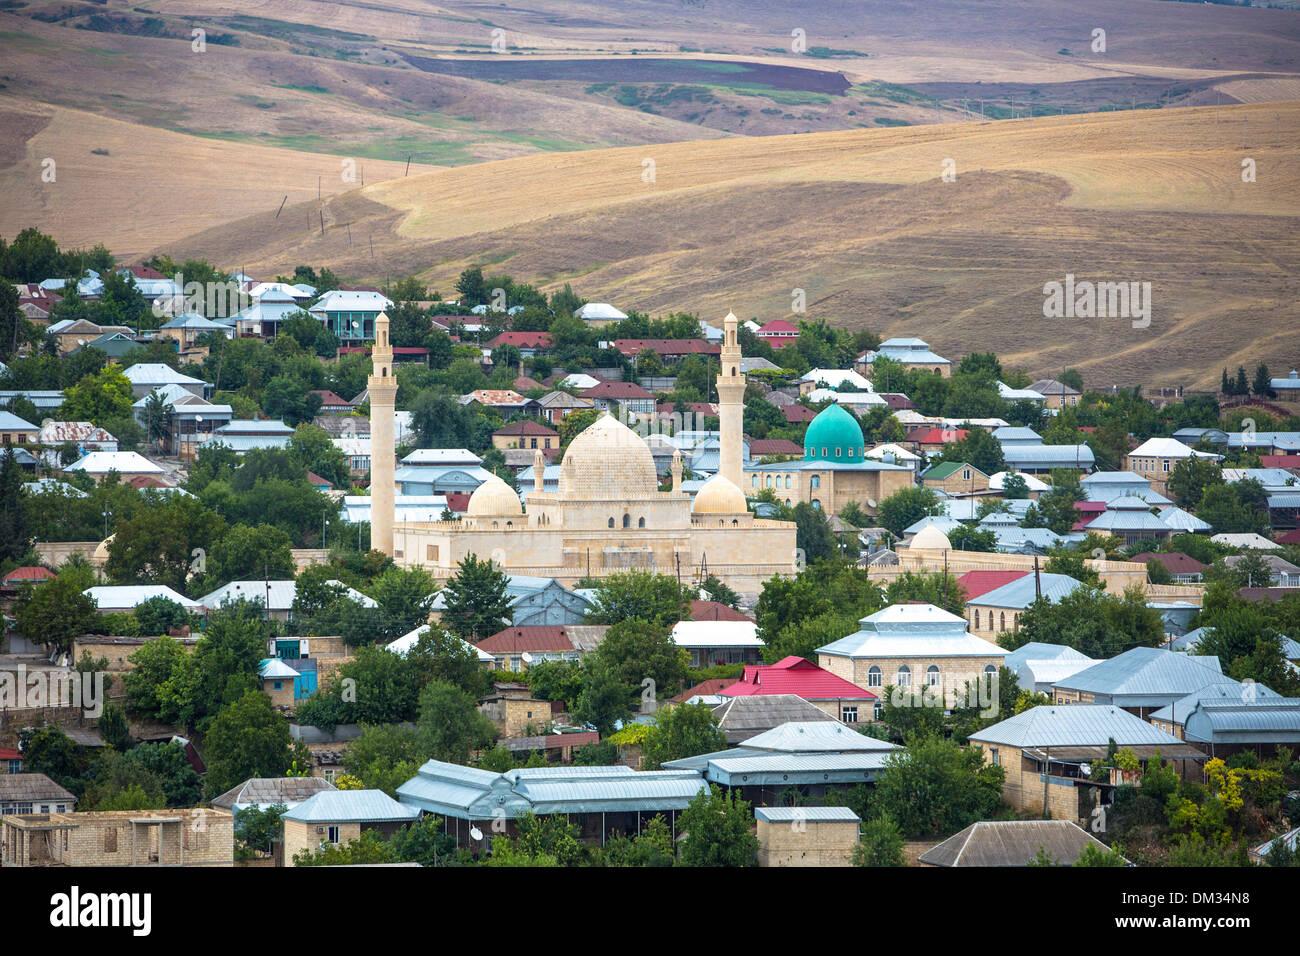 Azerbaijan Caucasus Eurasia Cuma Shamakhi Architecture City Stock Photo Alamy